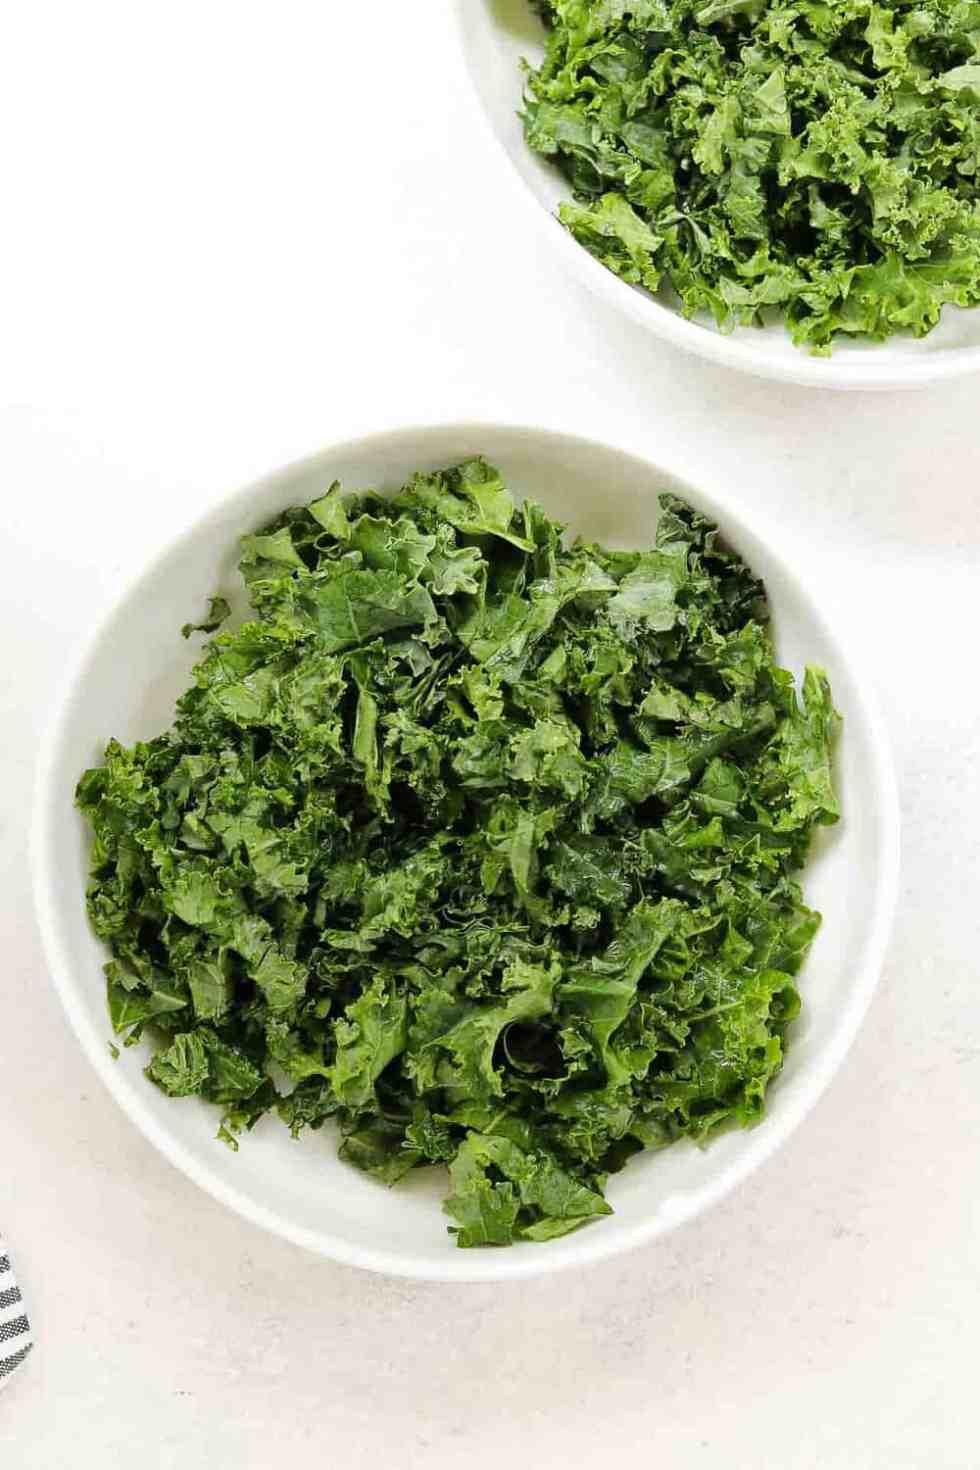 Chopped kale in two white bowls.